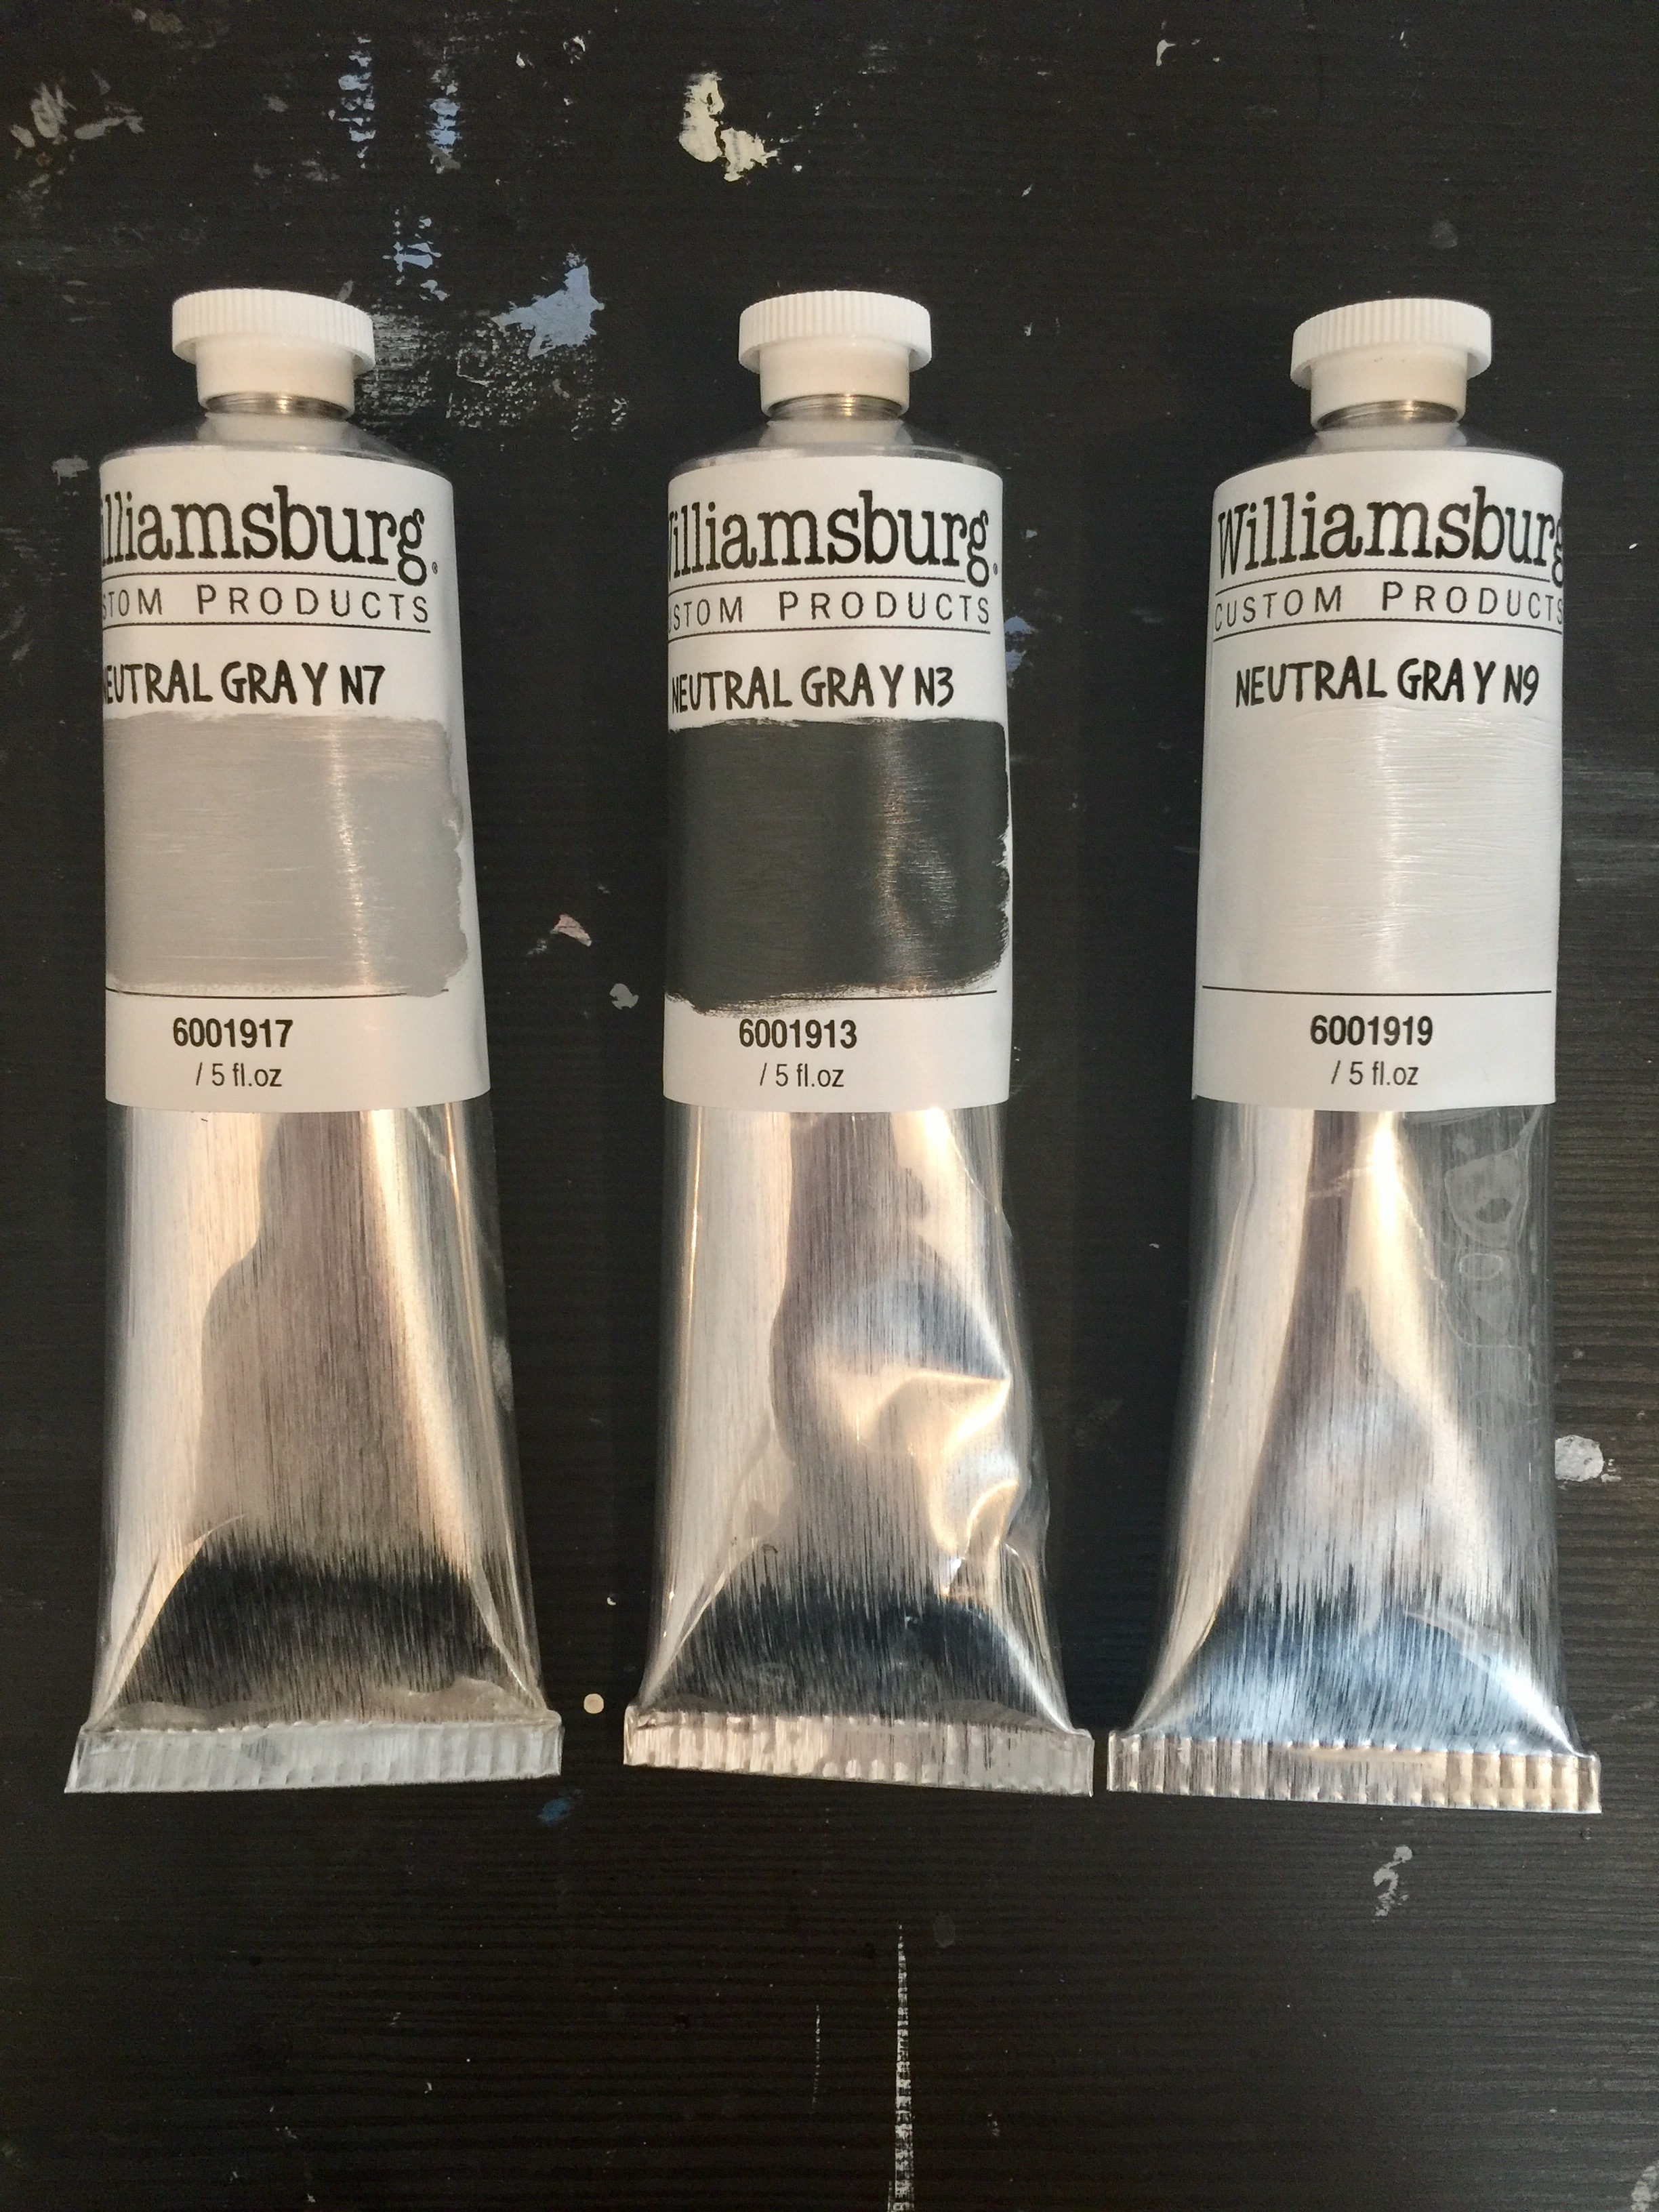 Custom N3, N7 & N9 Munsell Neutral Gray oil paint from Williamsburg Oil Paint